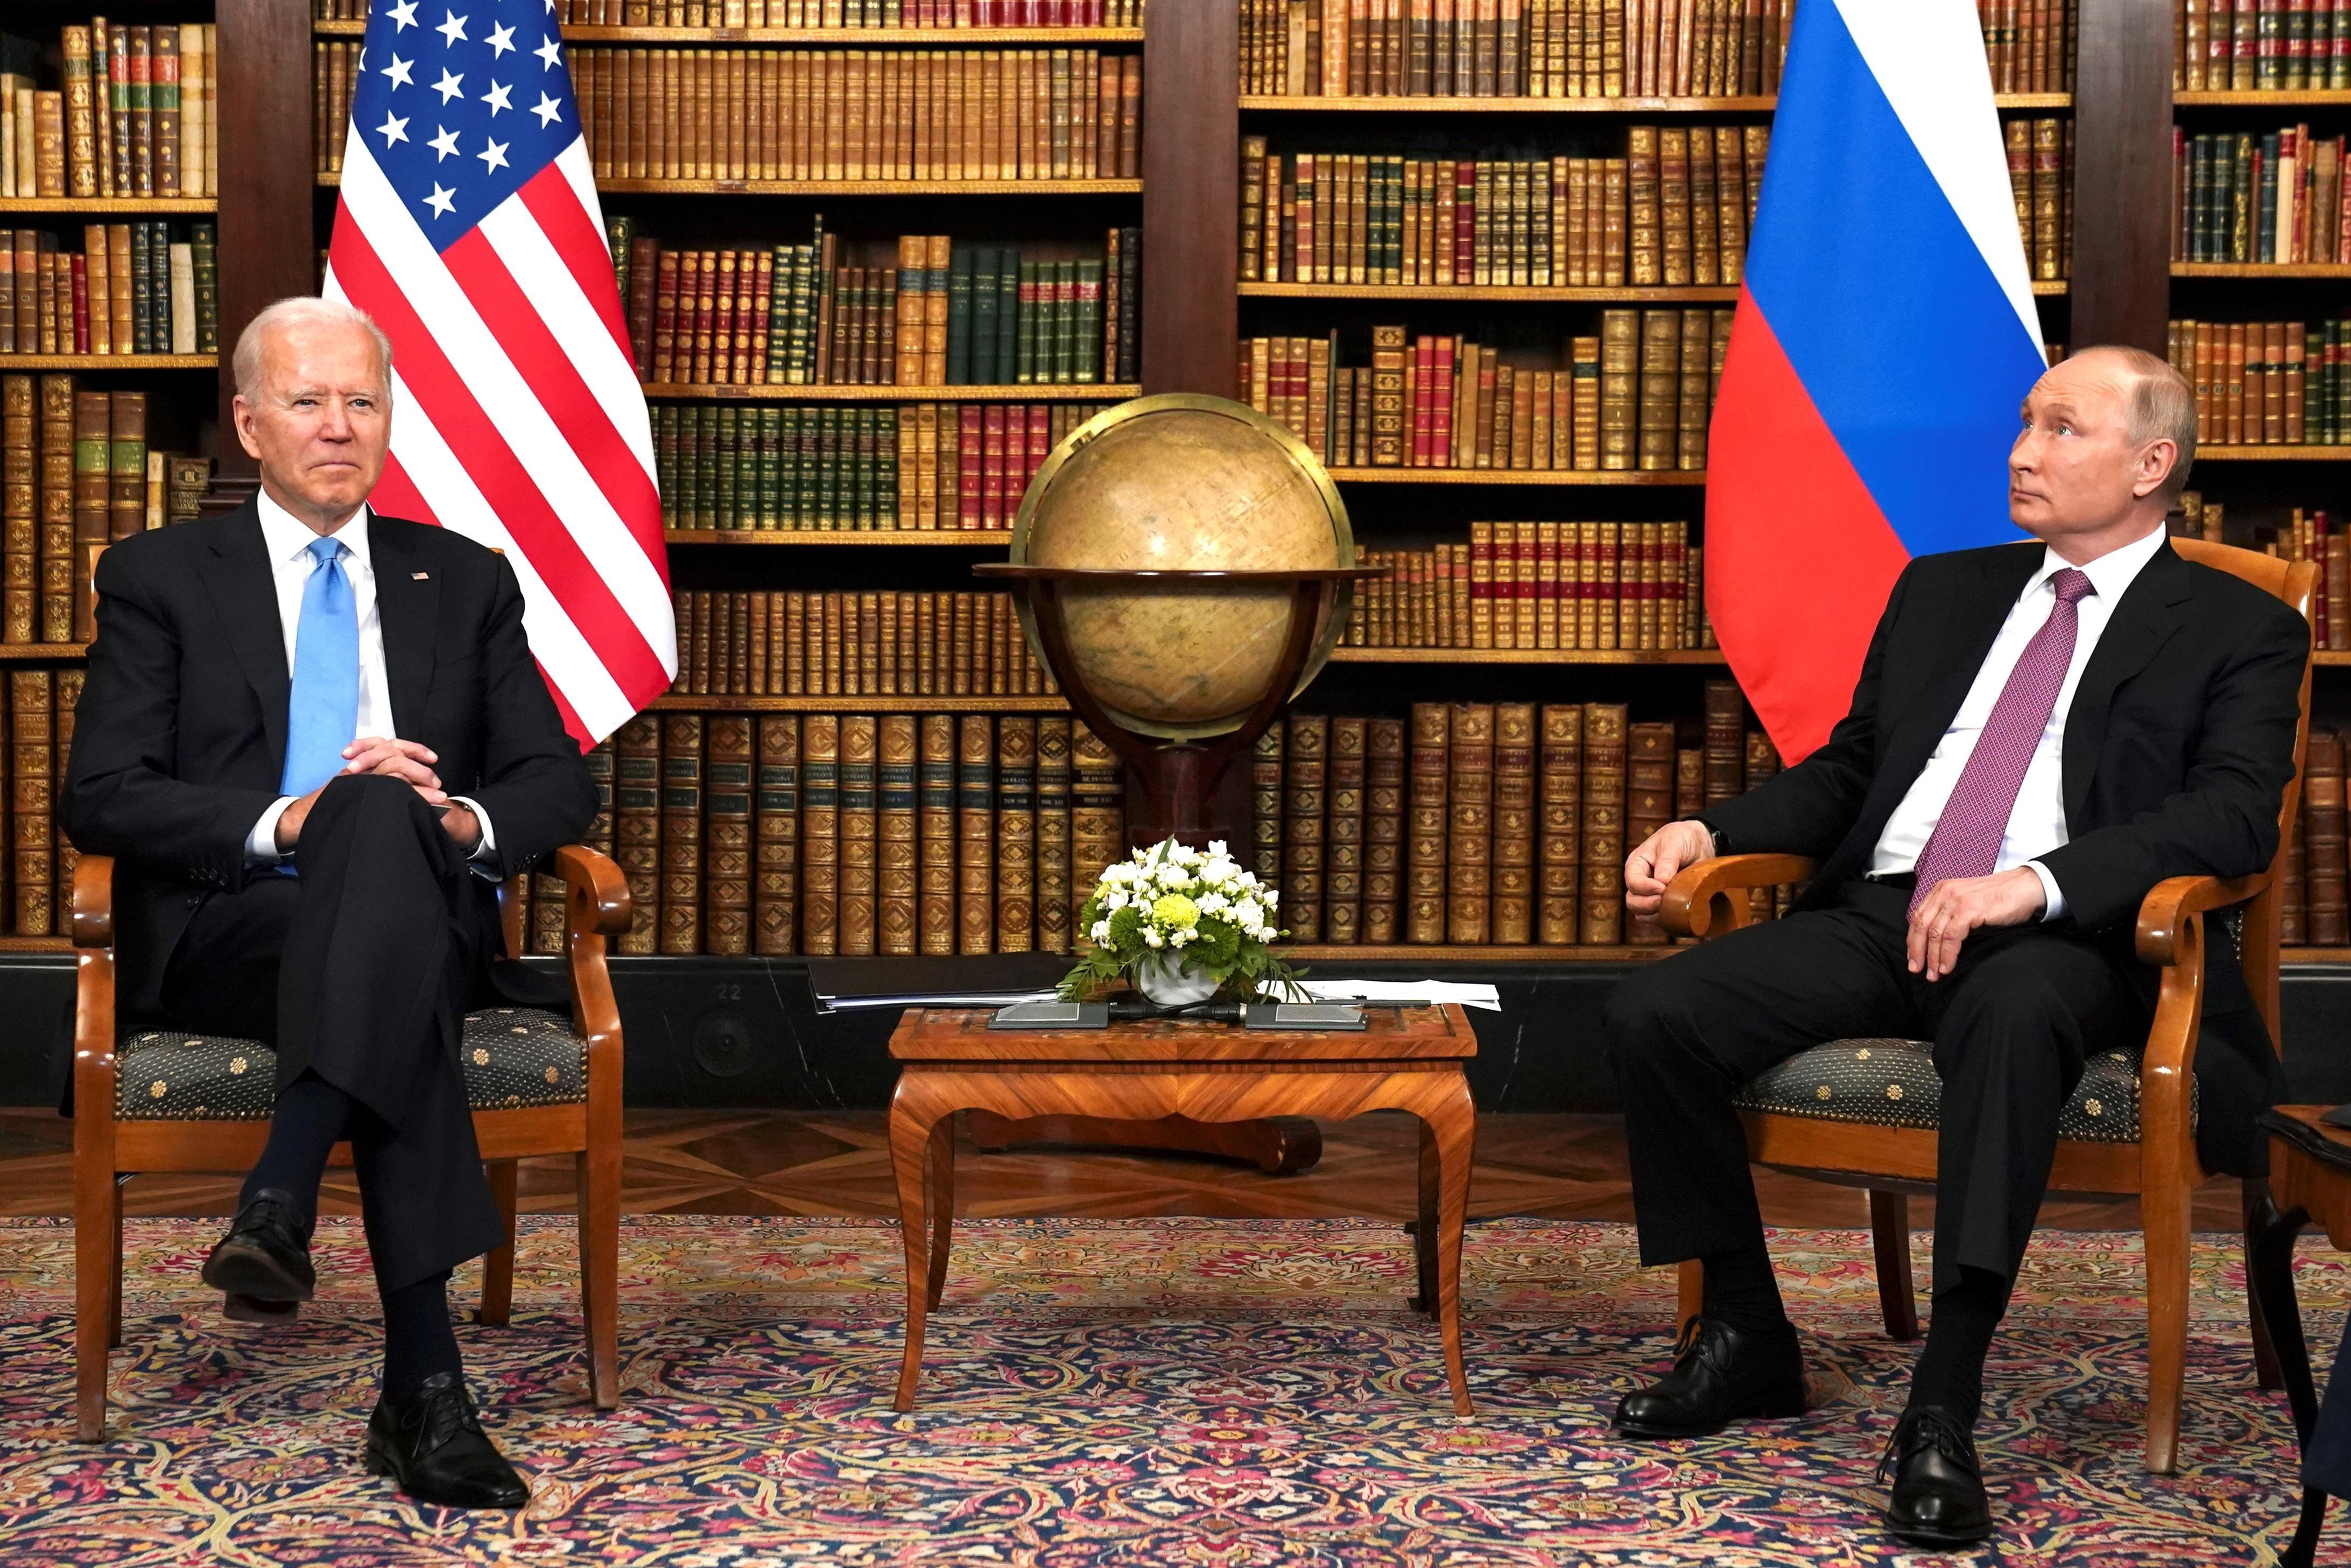 What We're Watching: Biden-Putin summit, North Korean food crisis, Tunisian constitutional reform